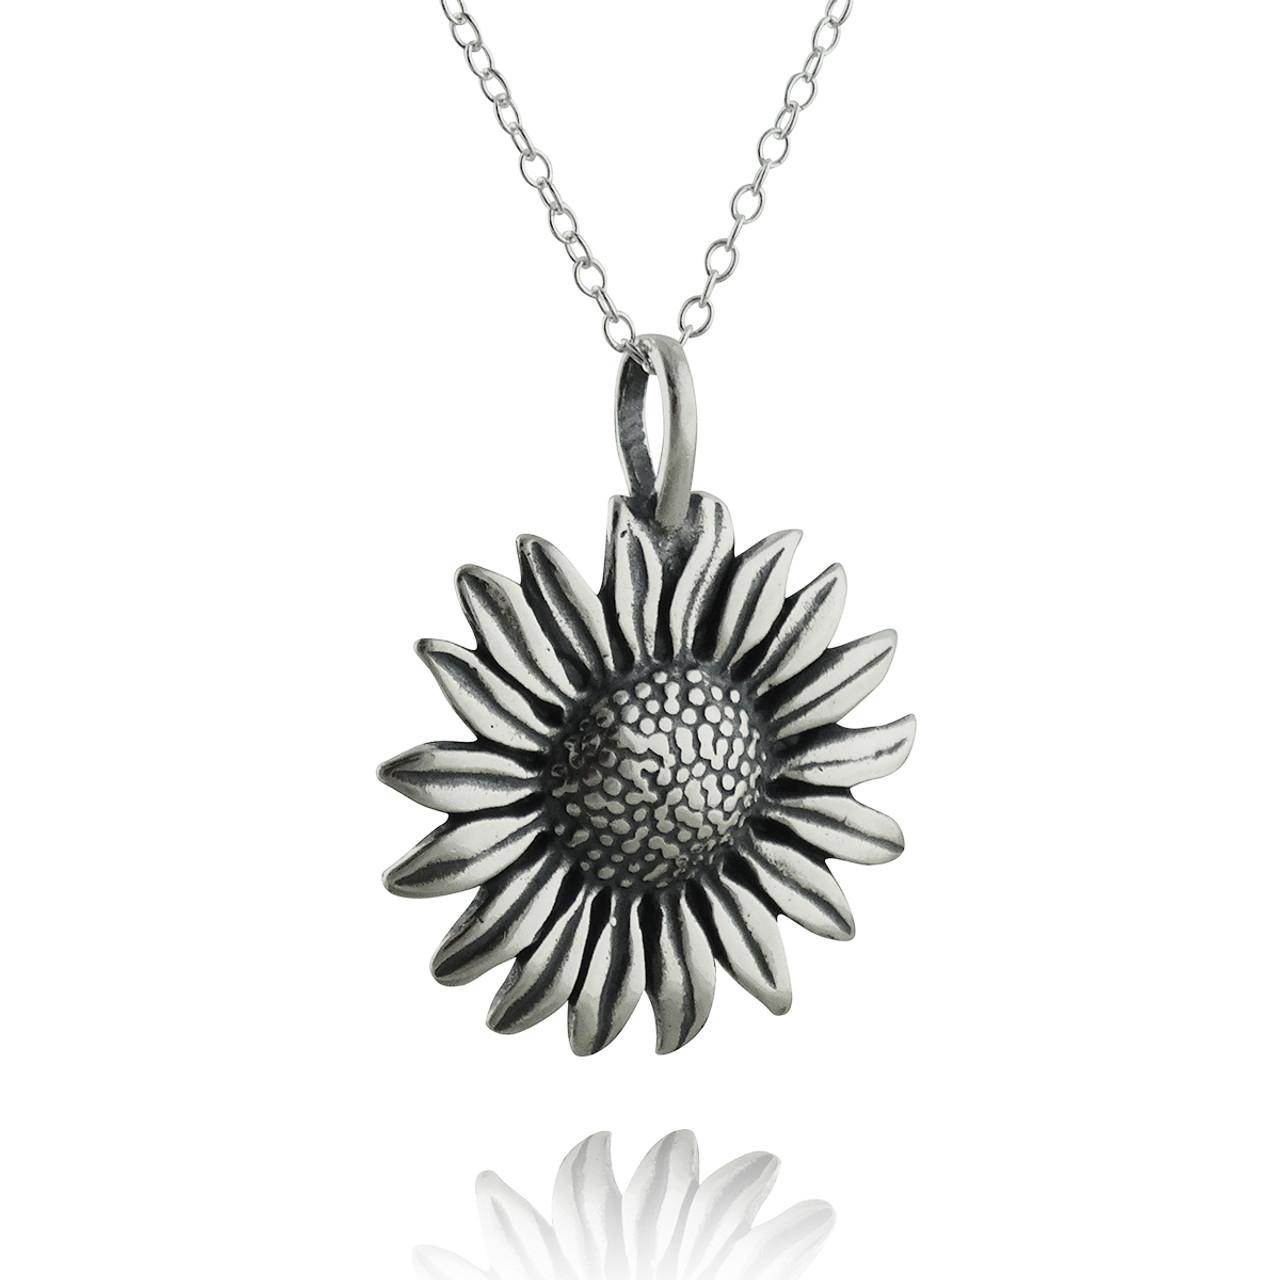 Sunflower pendant necklace sterling silver aloadofball Gallery